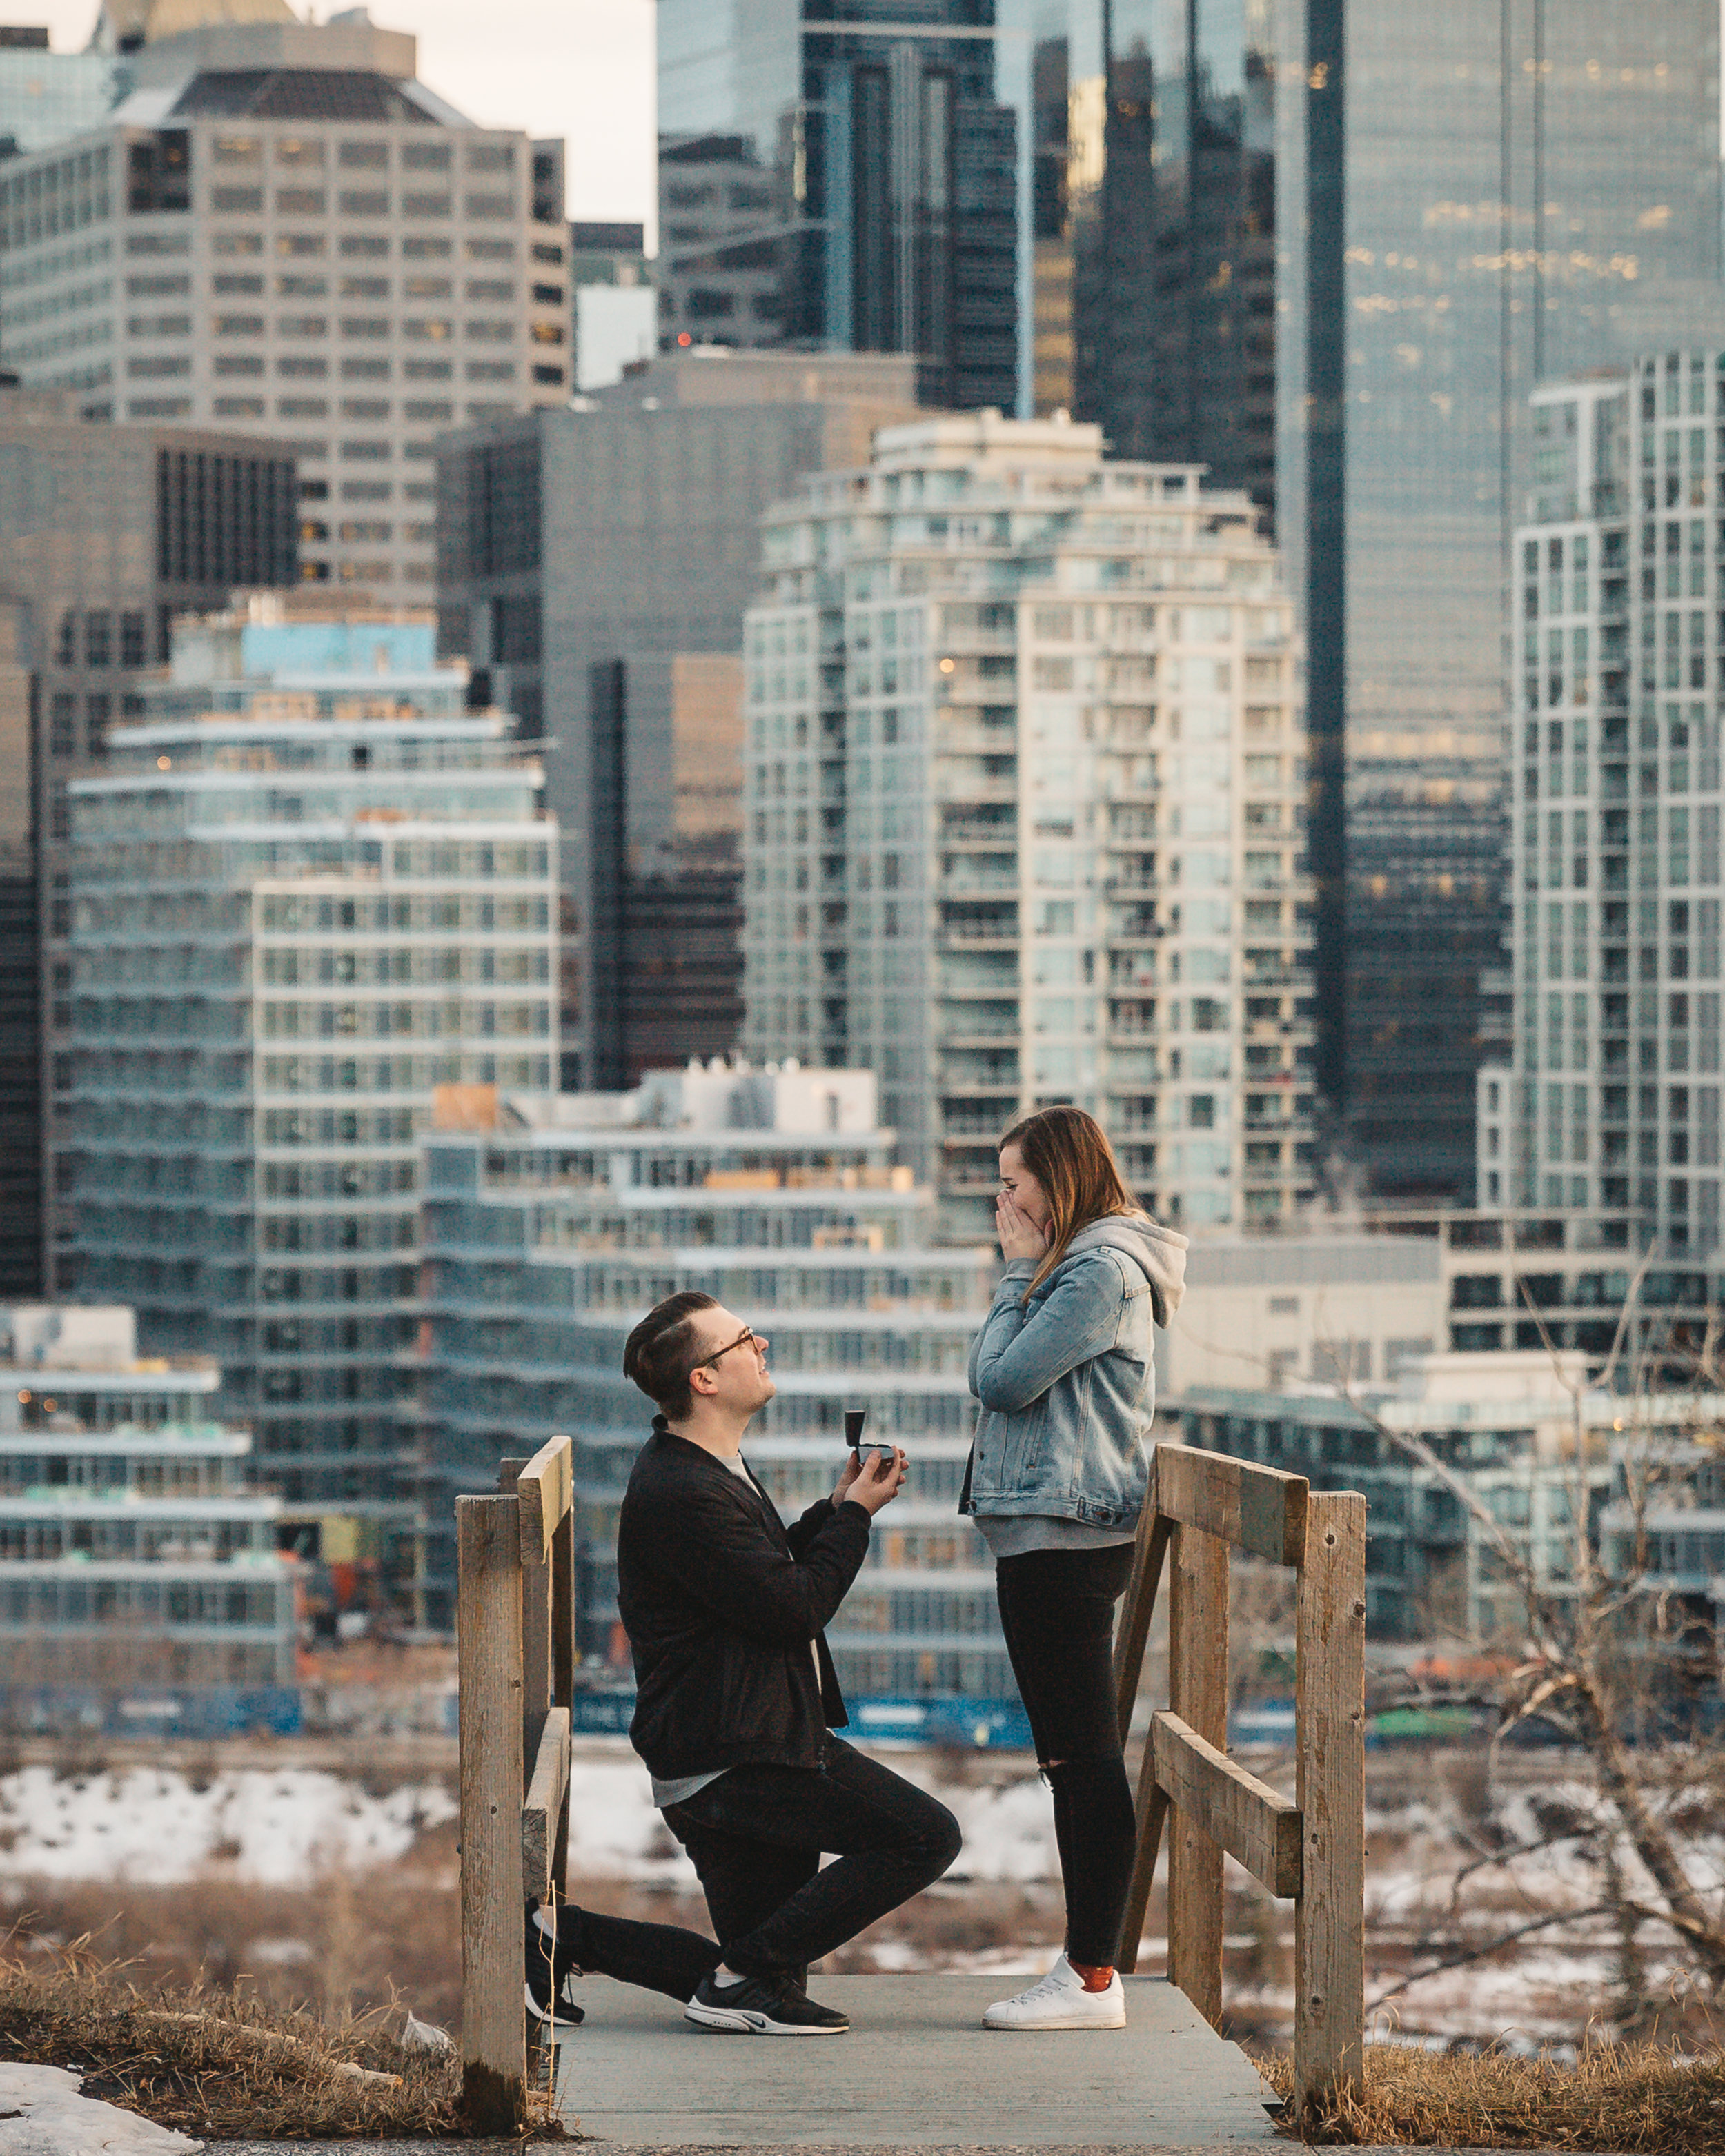 DAVEY Zan for website1  Romance Your Wild (1 of 1).JPG